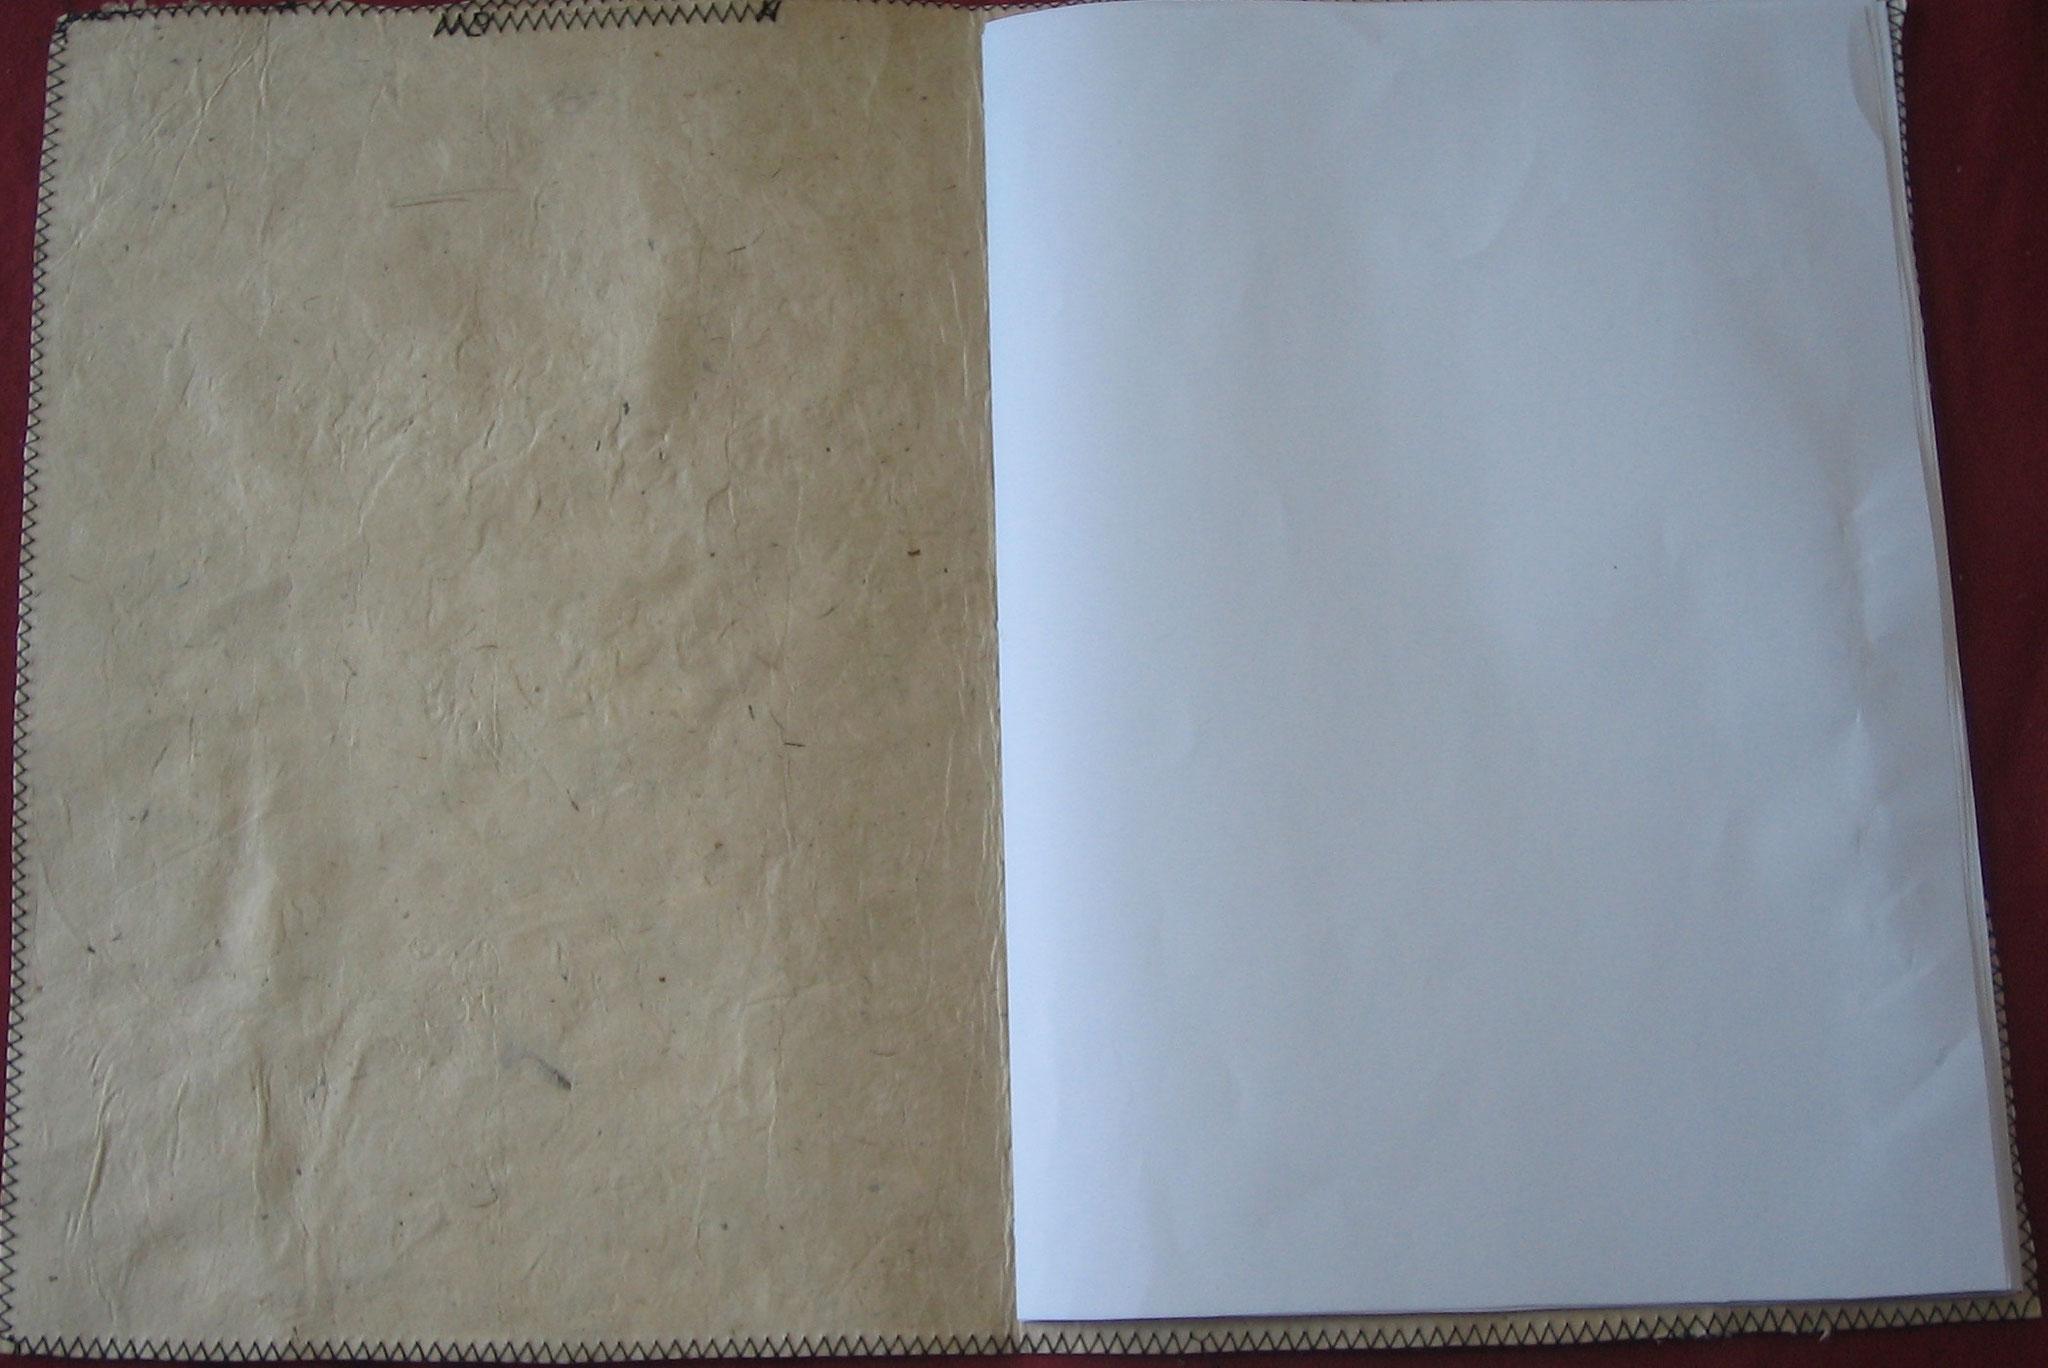 "Innenansicht Softcover-Buch Collage ""Beauty and the ..."", handgeschöpftes Loktapapier"